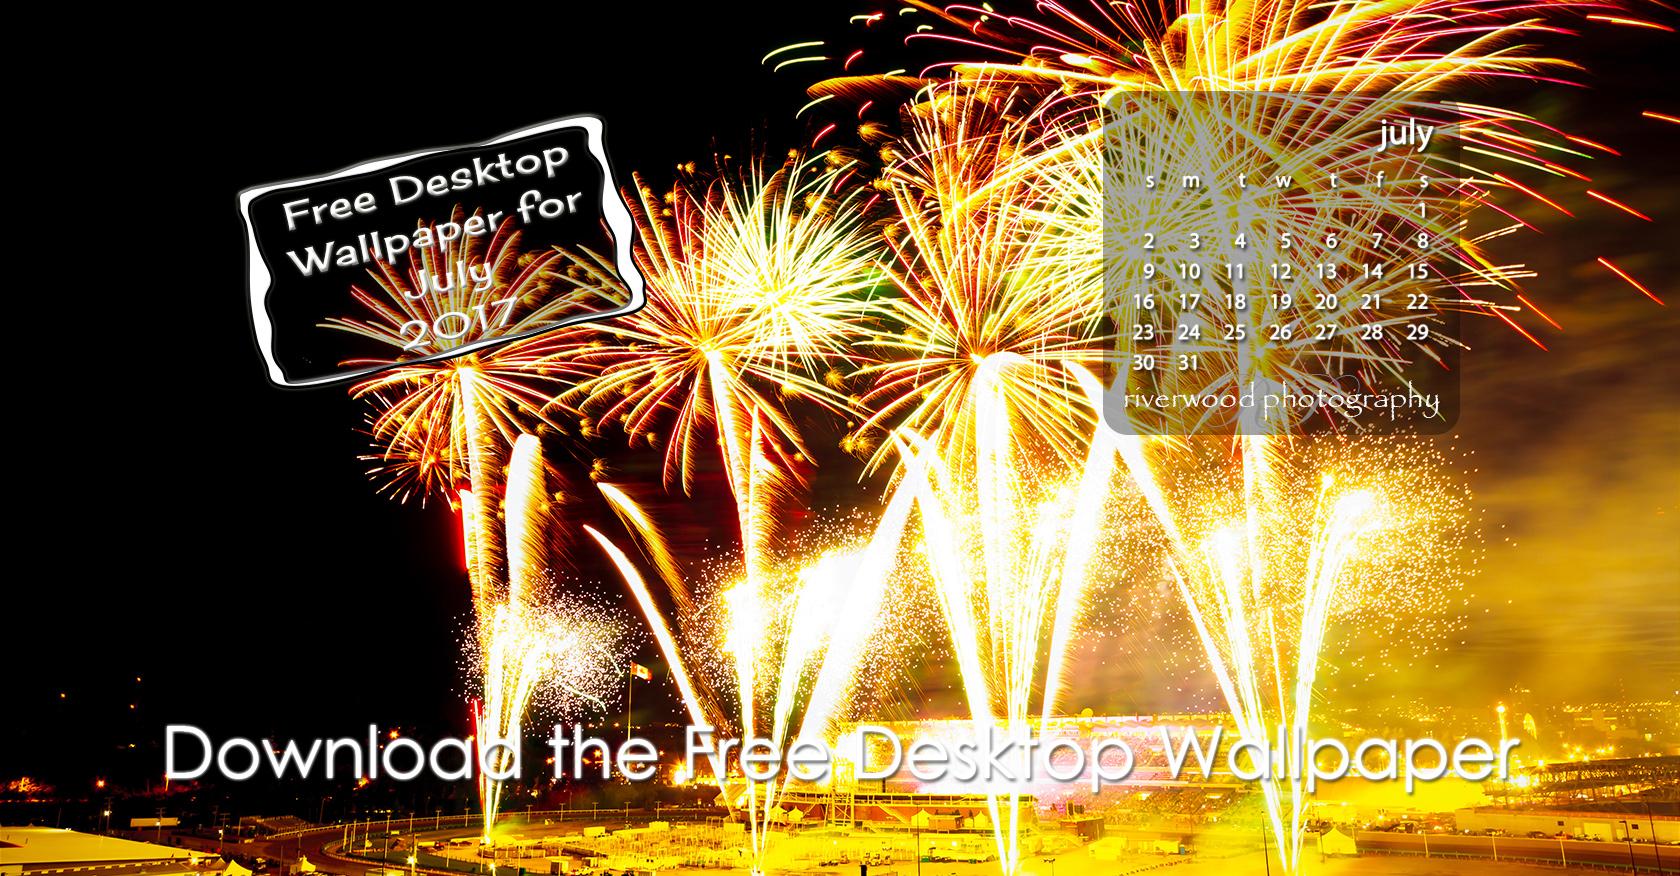 Free Desktop Wallpaper for July 2017